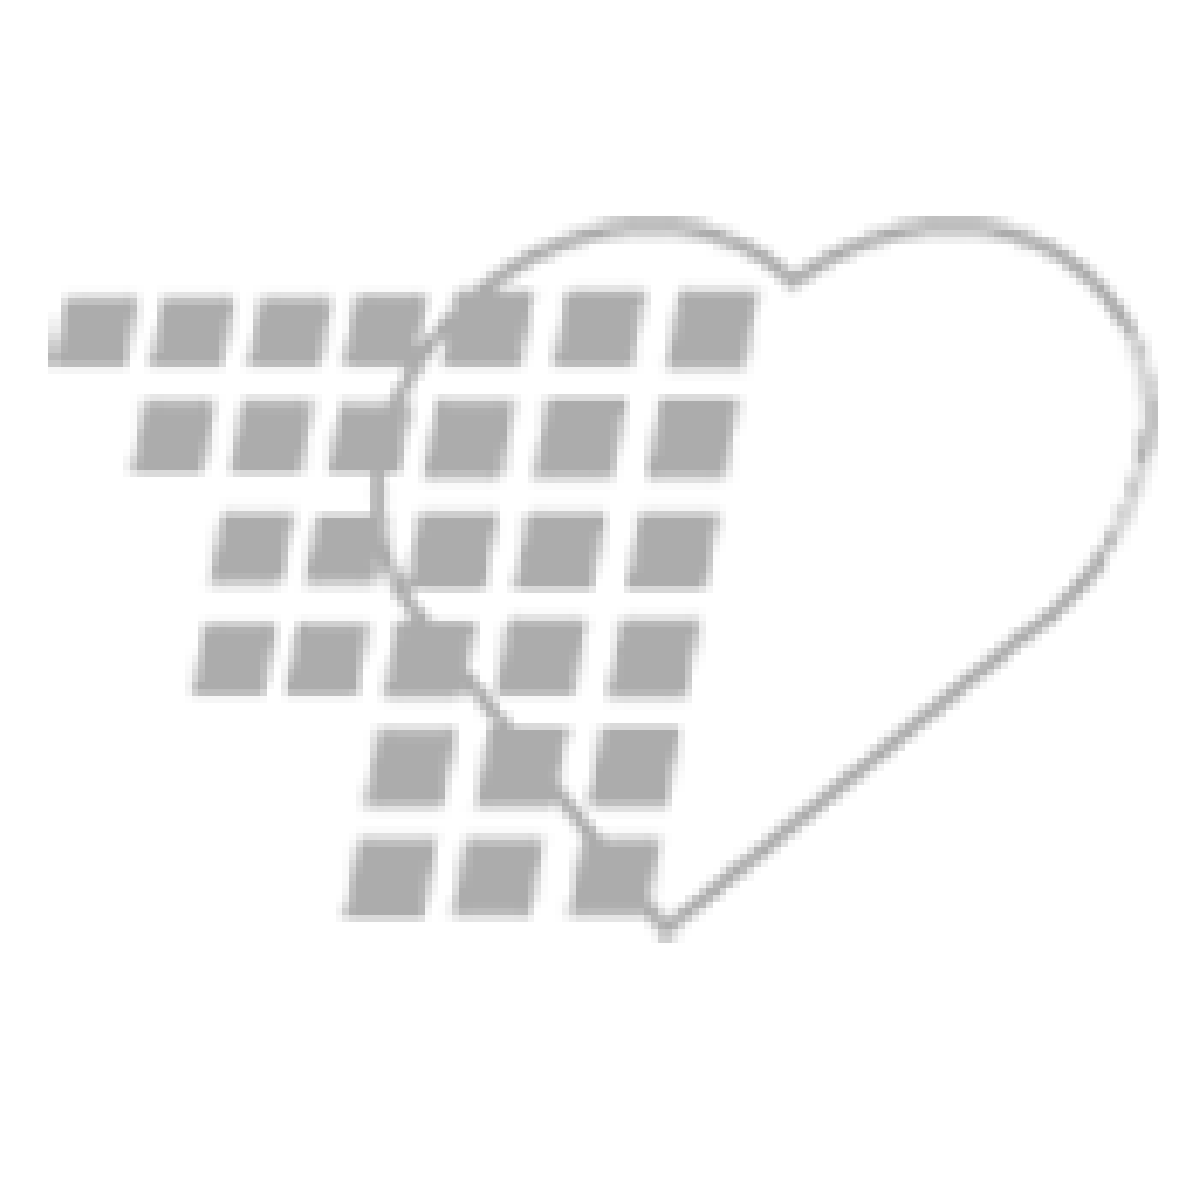 14-17-0650 - Simulaids Nursing Care Moulage Kit